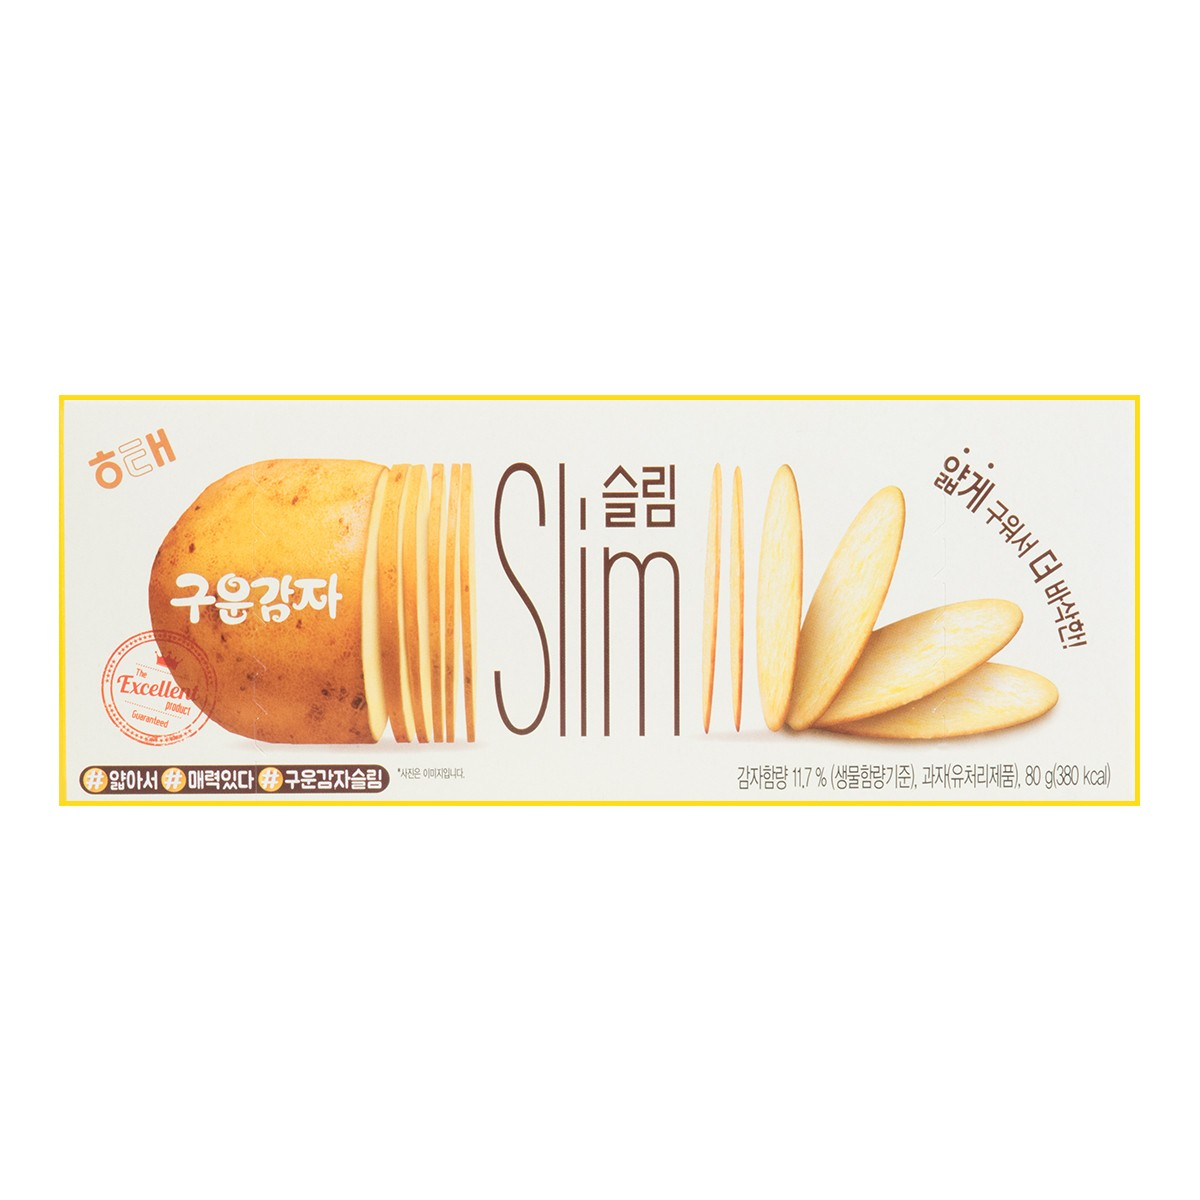 HAITAI Baked Potato Slim 80g